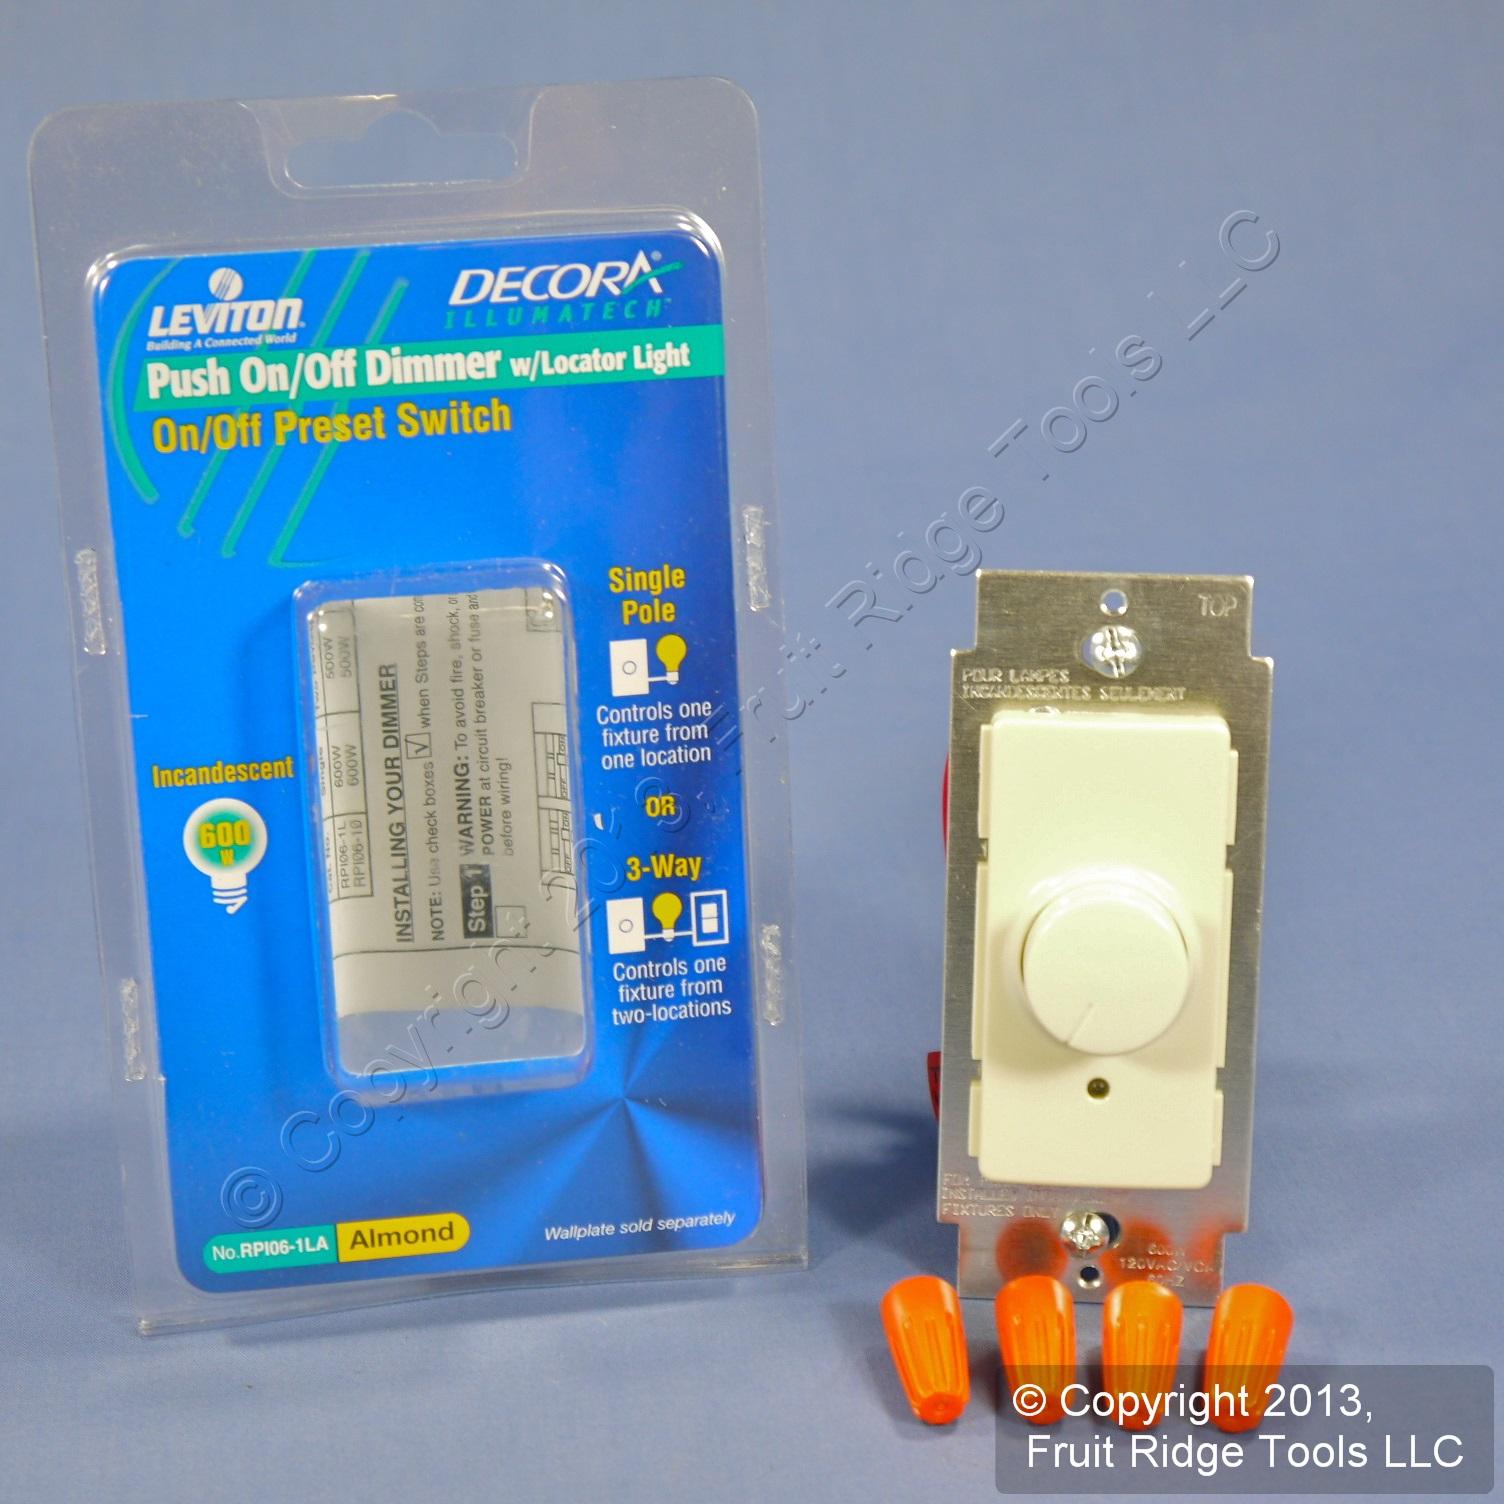 Shop Leviton Illumatech Almond Push On Off Preset Rotary 2 Pole 3 Way Slide Switch Dimmer Light Single Or 660w Incandescent Rpi06 1la Fruit Ridge Tools